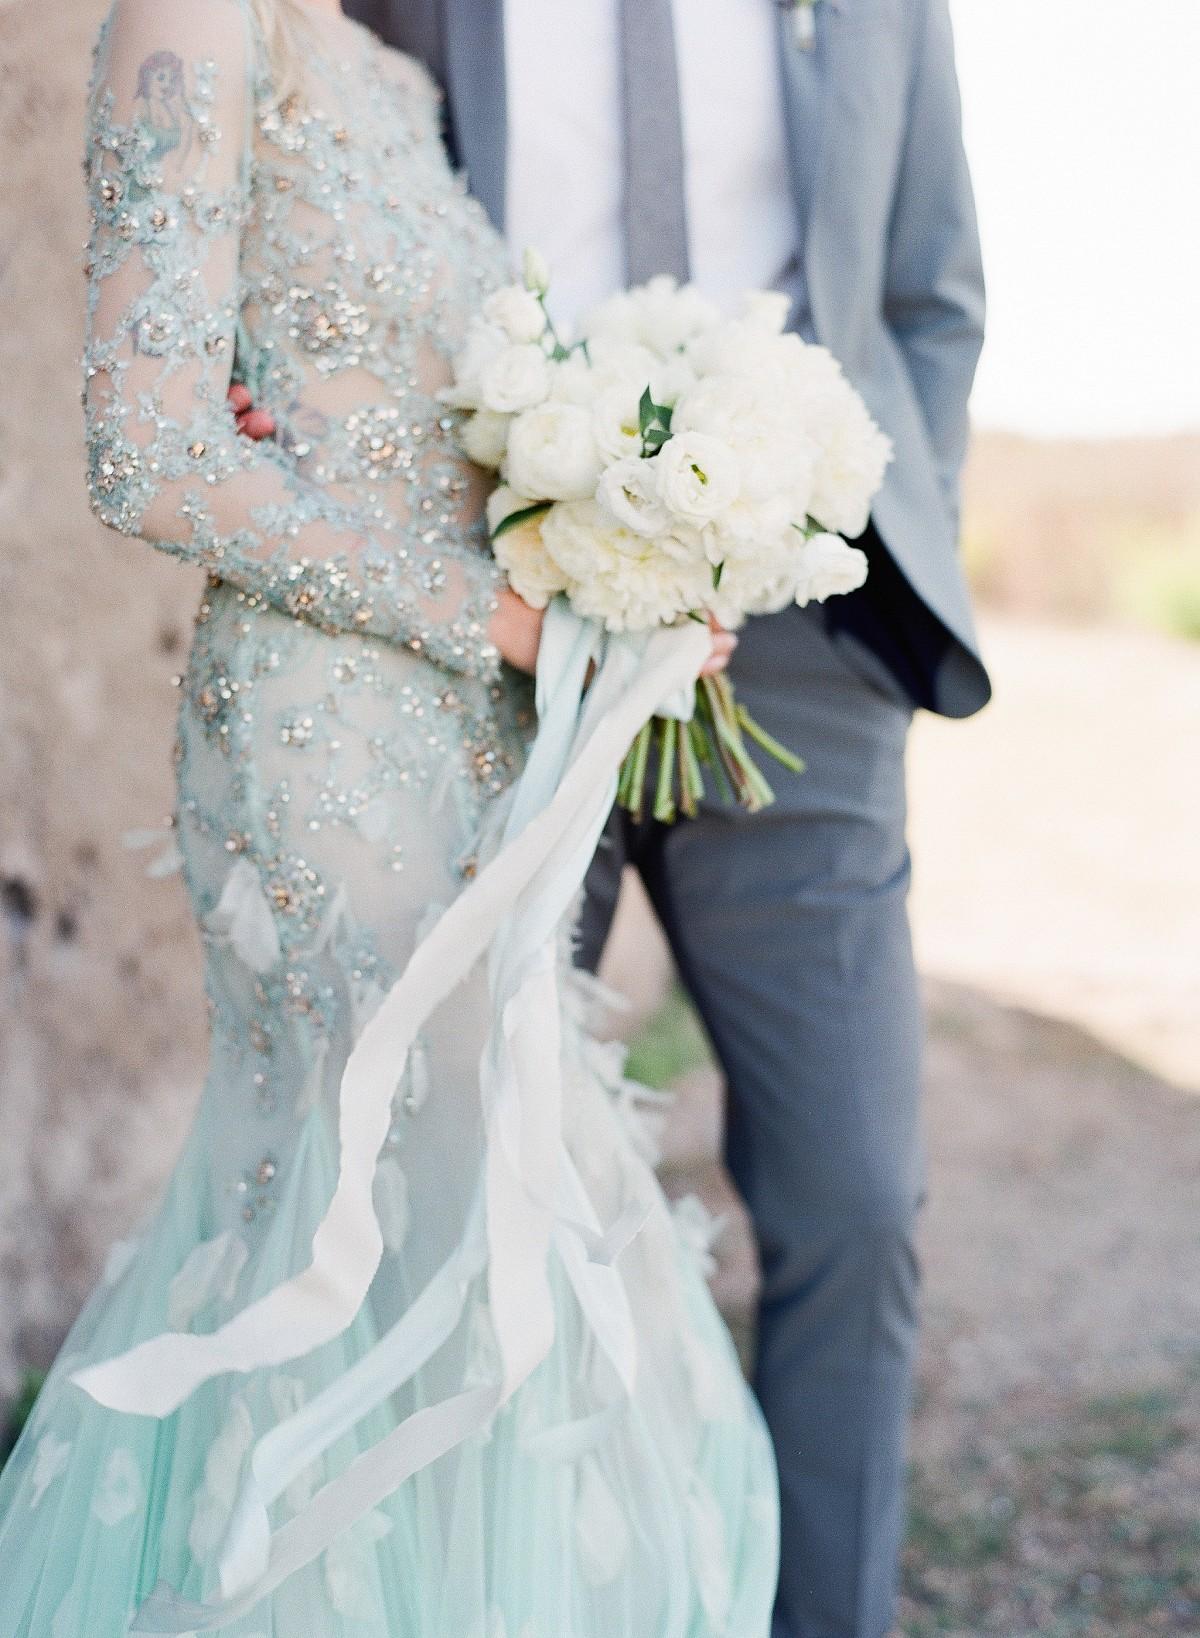 Destination Wedding Inspiration in Greece